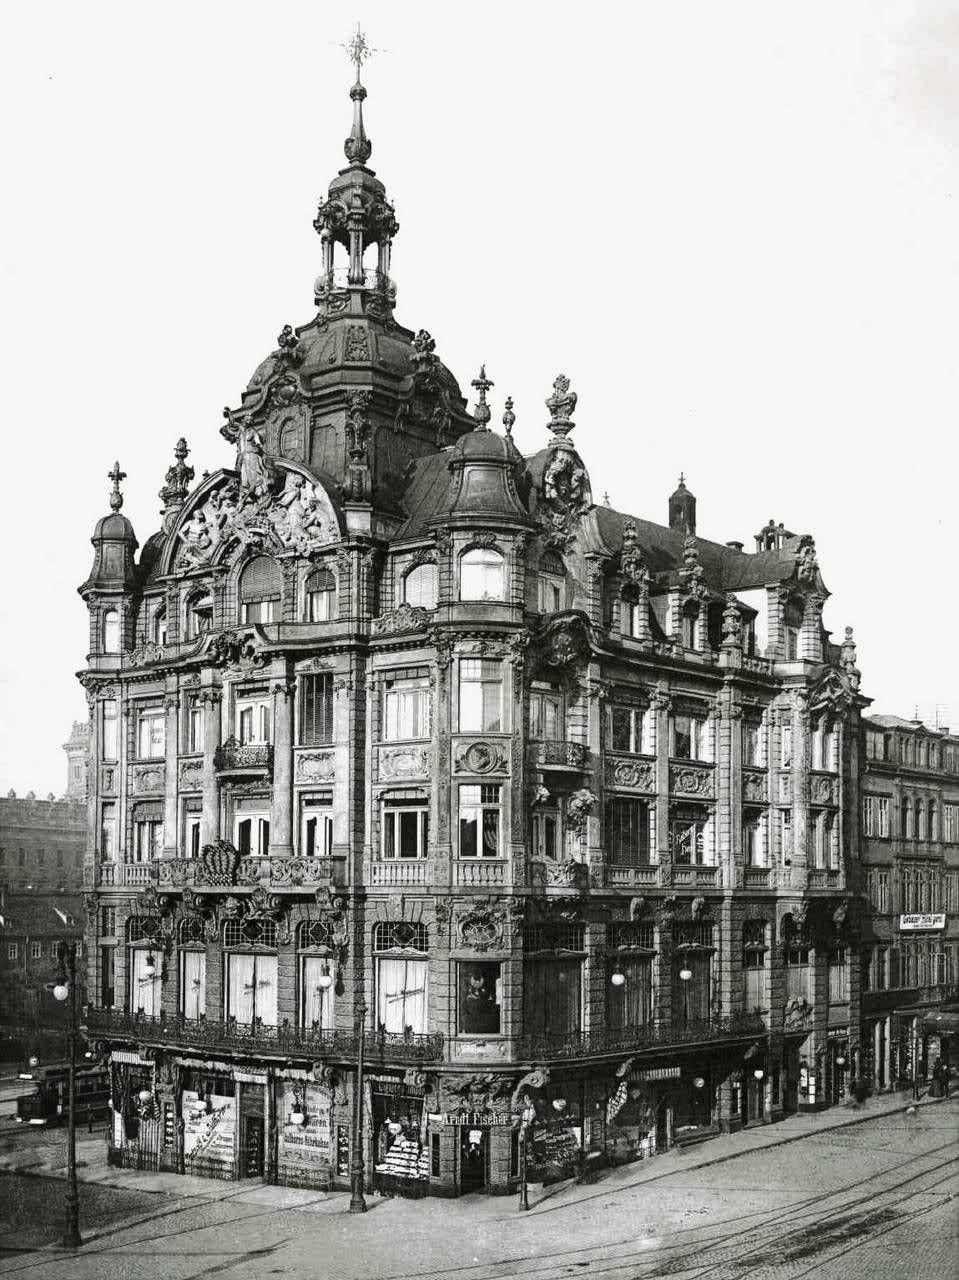 The Kaiserpalast